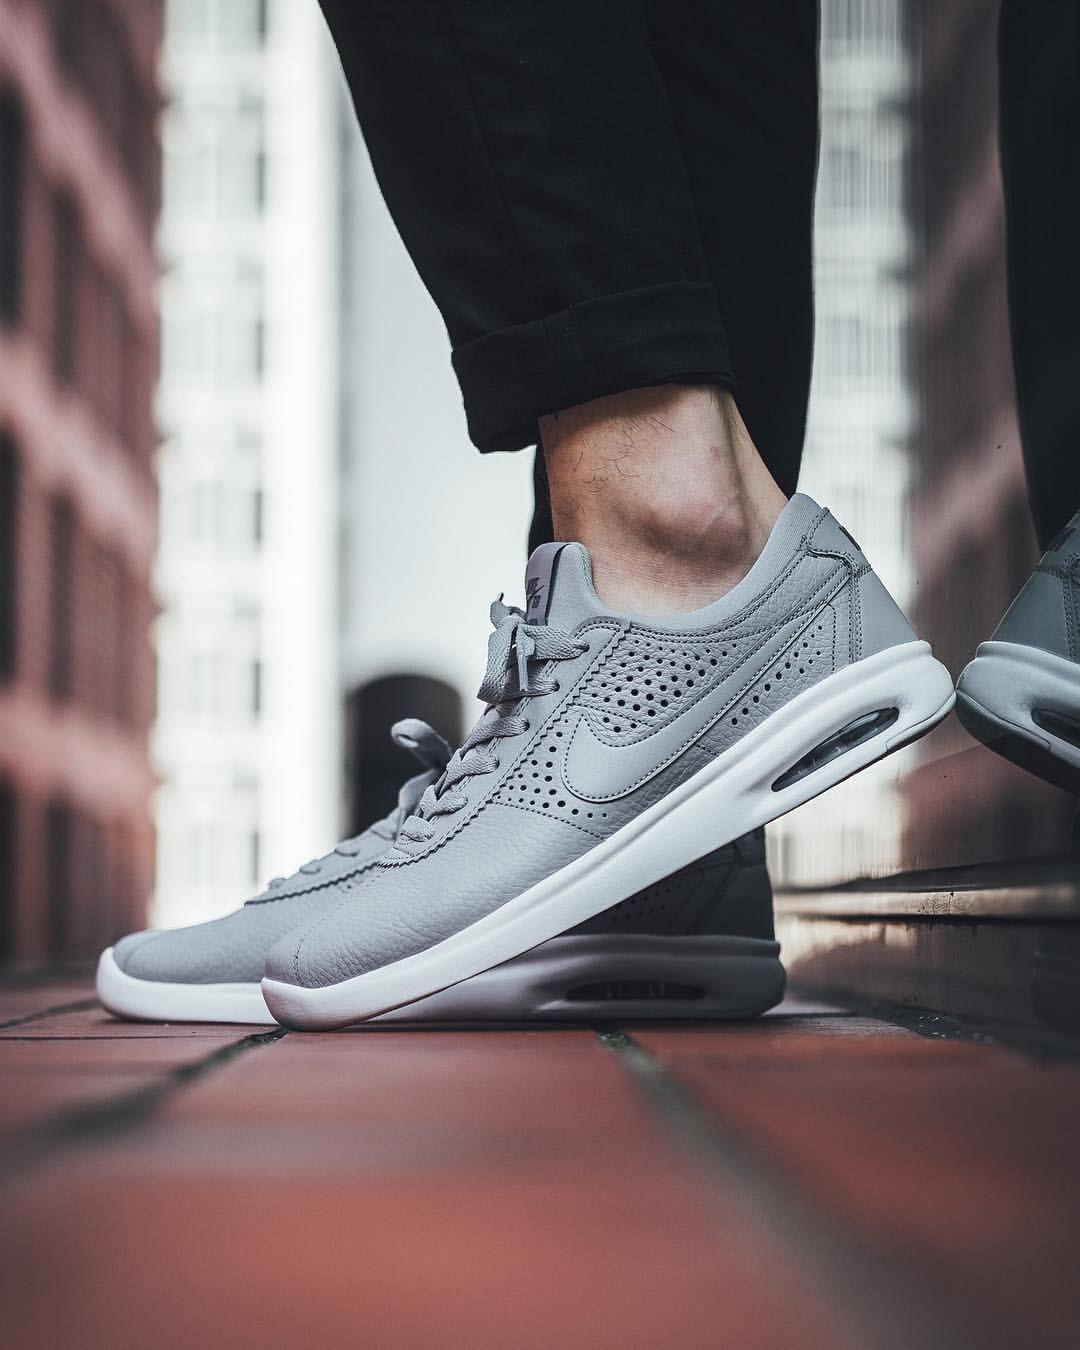 Nike SB Air Max Bruin Vapor: Wolf Grey